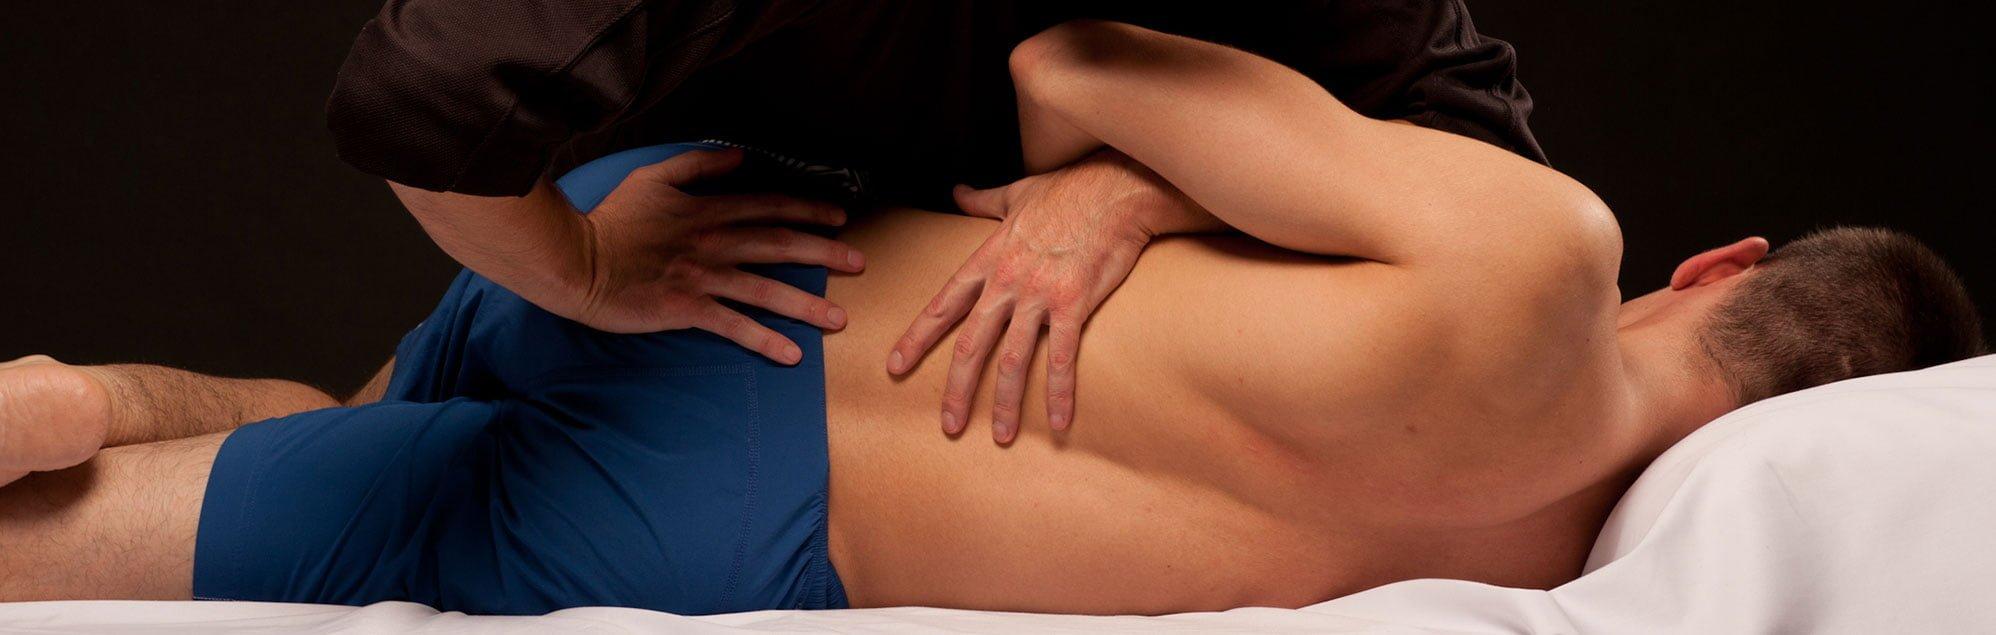 Centre-TMO-physiotherapie-osteopathie-massotherapie-Gatineau-Hull-MGP_4990